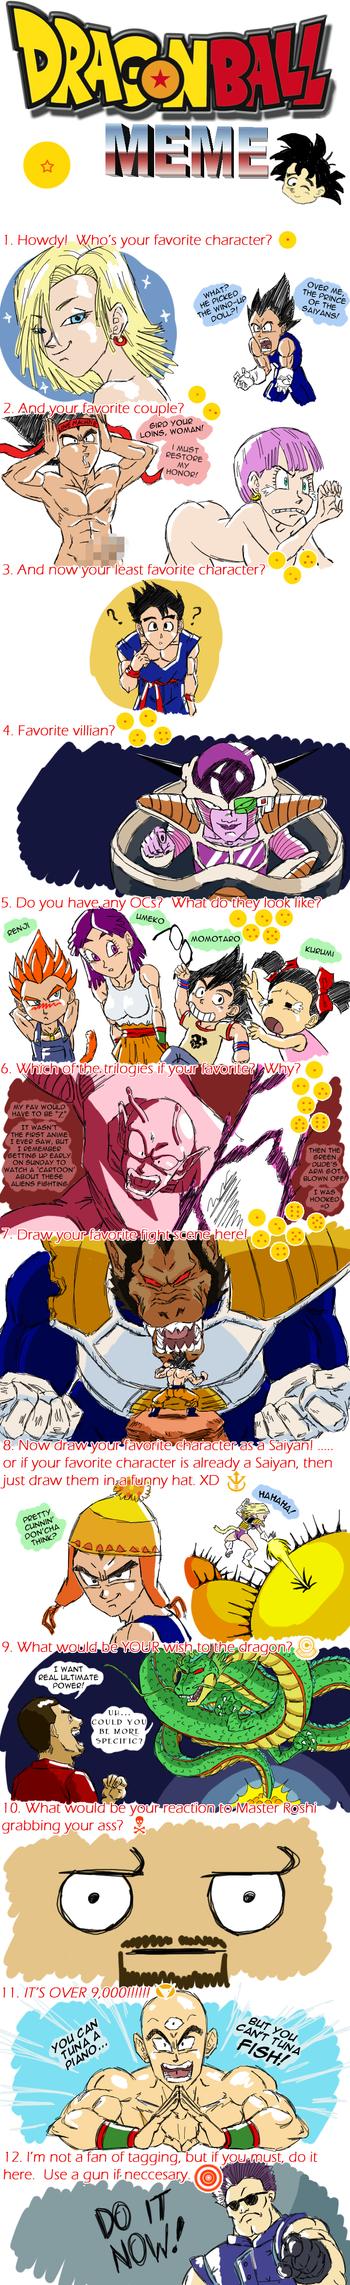 Dragon Ball Meme by SonGoharotto